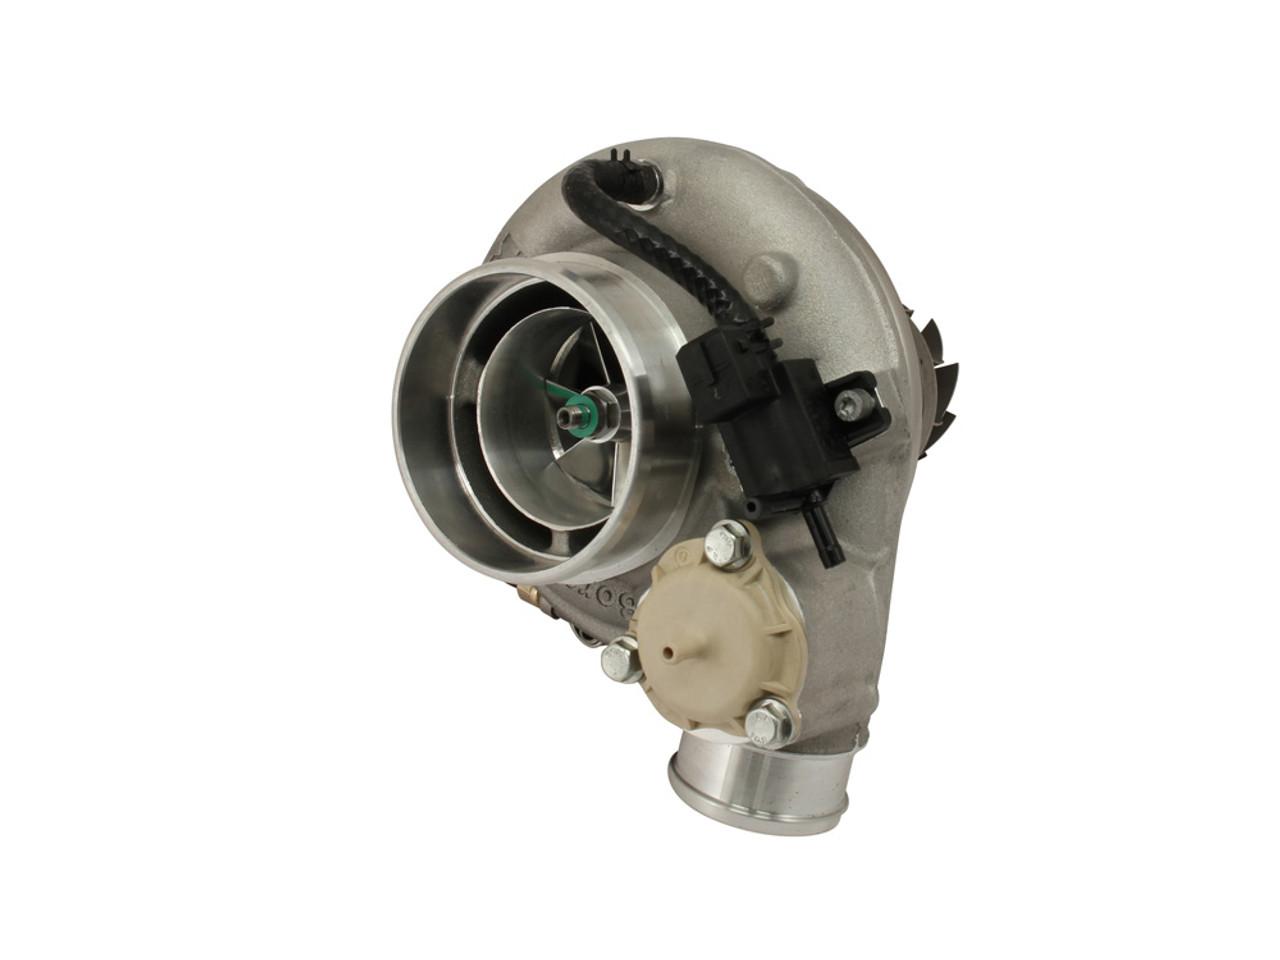 Borg Warner / AGP EFR 8370